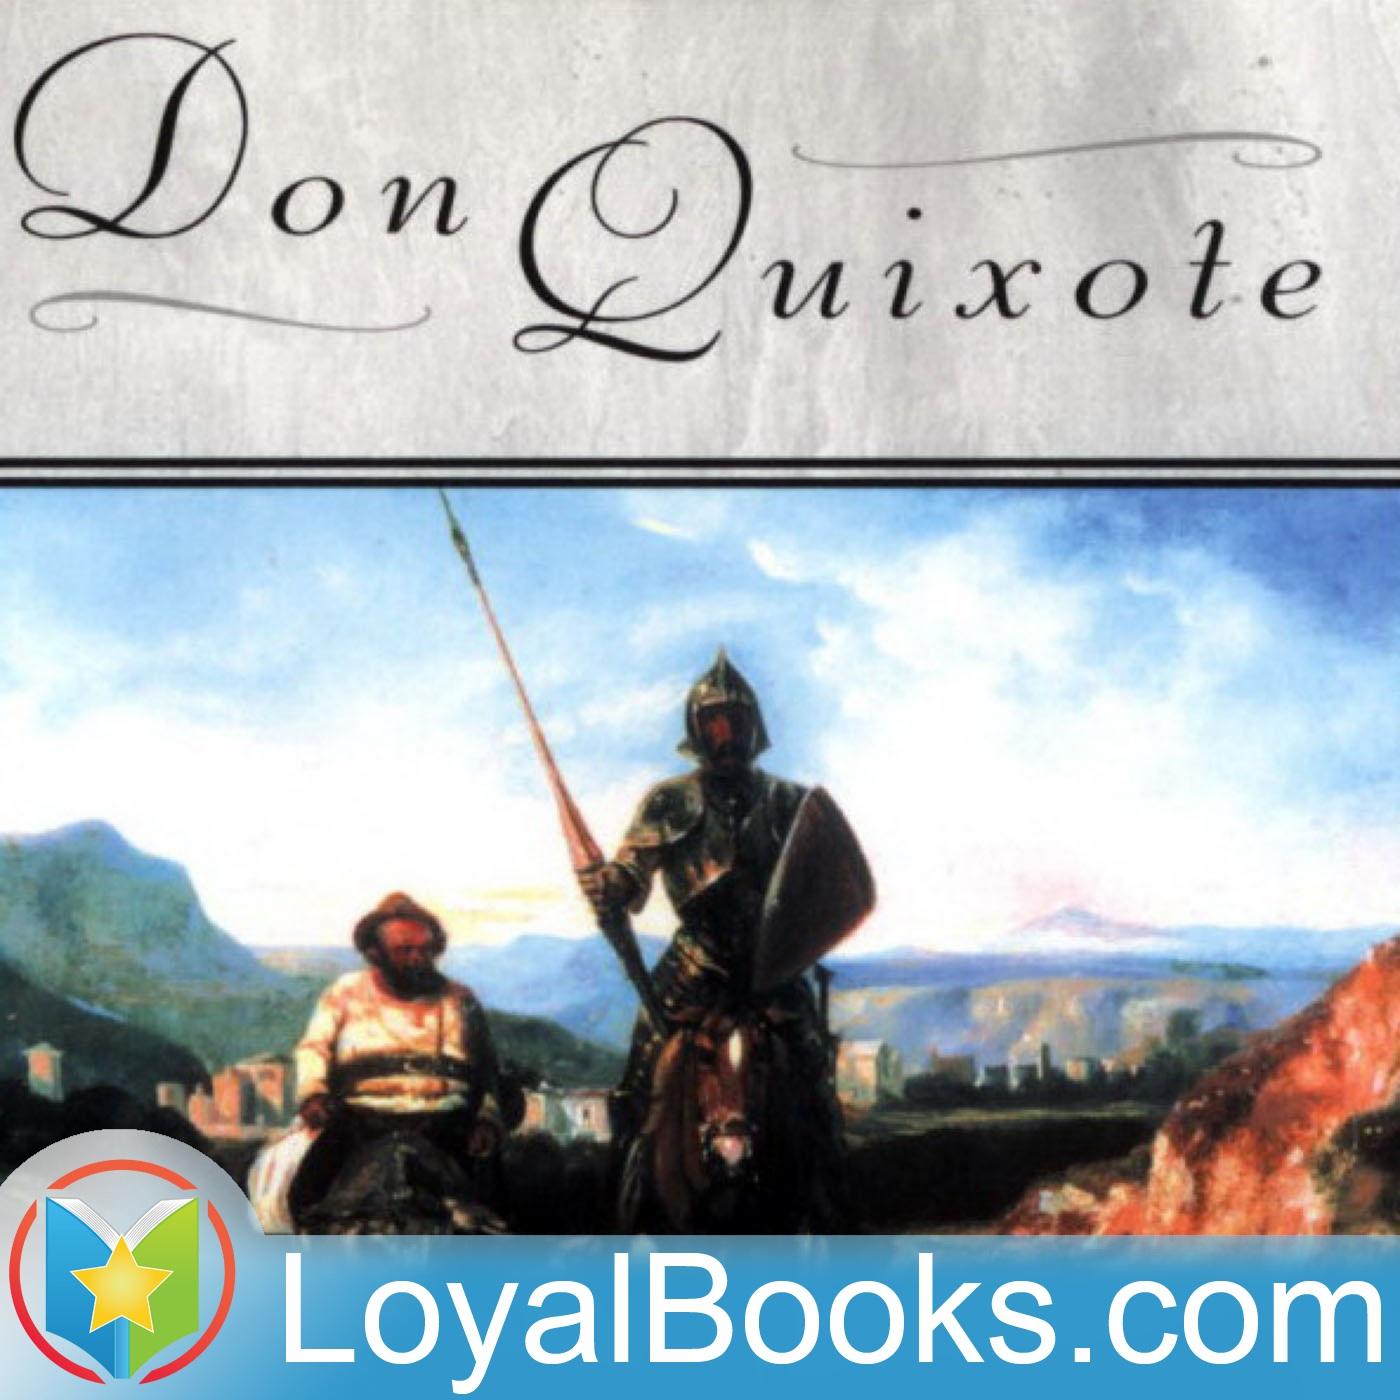 <![CDATA[Don Quijote by Miguel de Cervantes Saavedra]]>